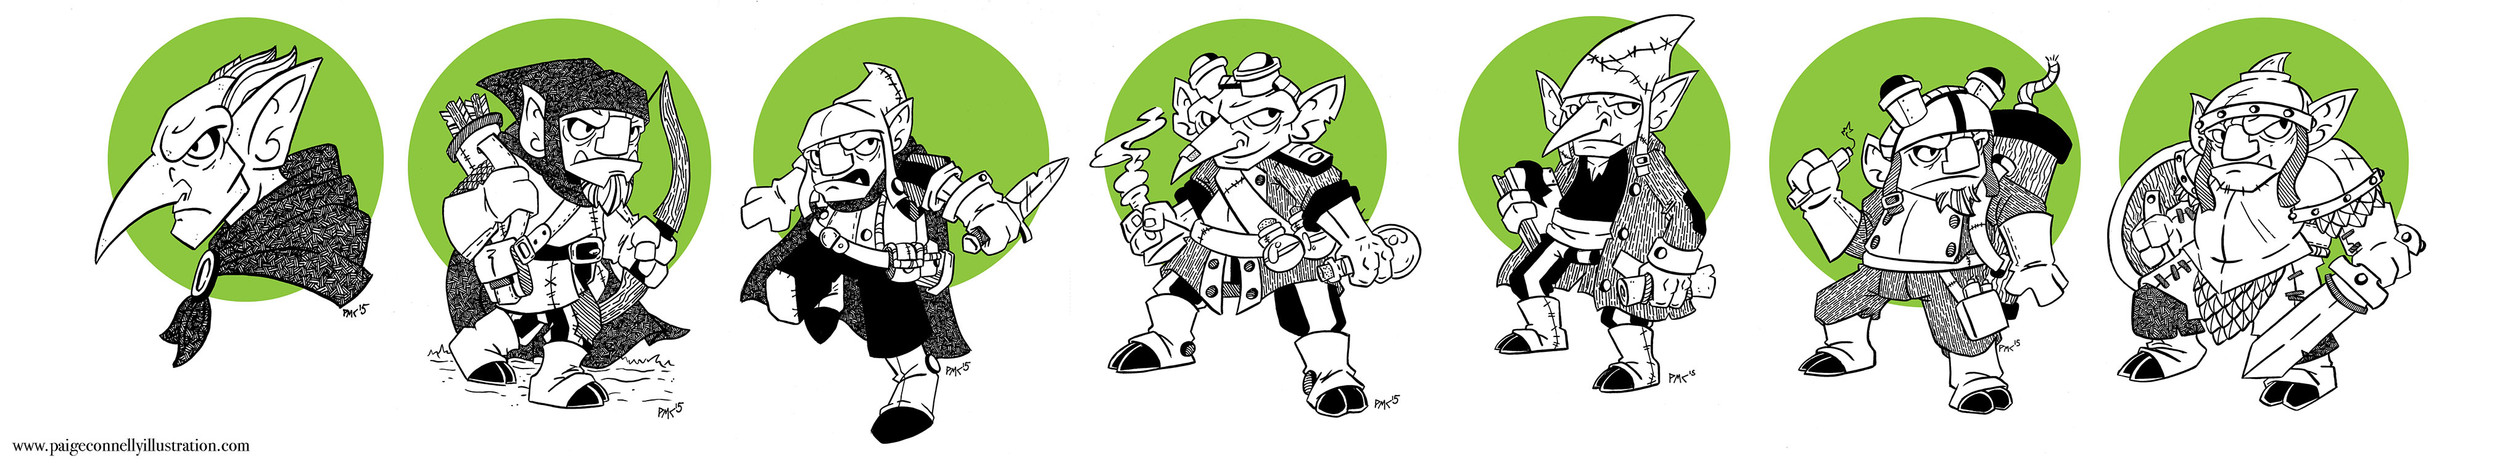 goblin_week_2015